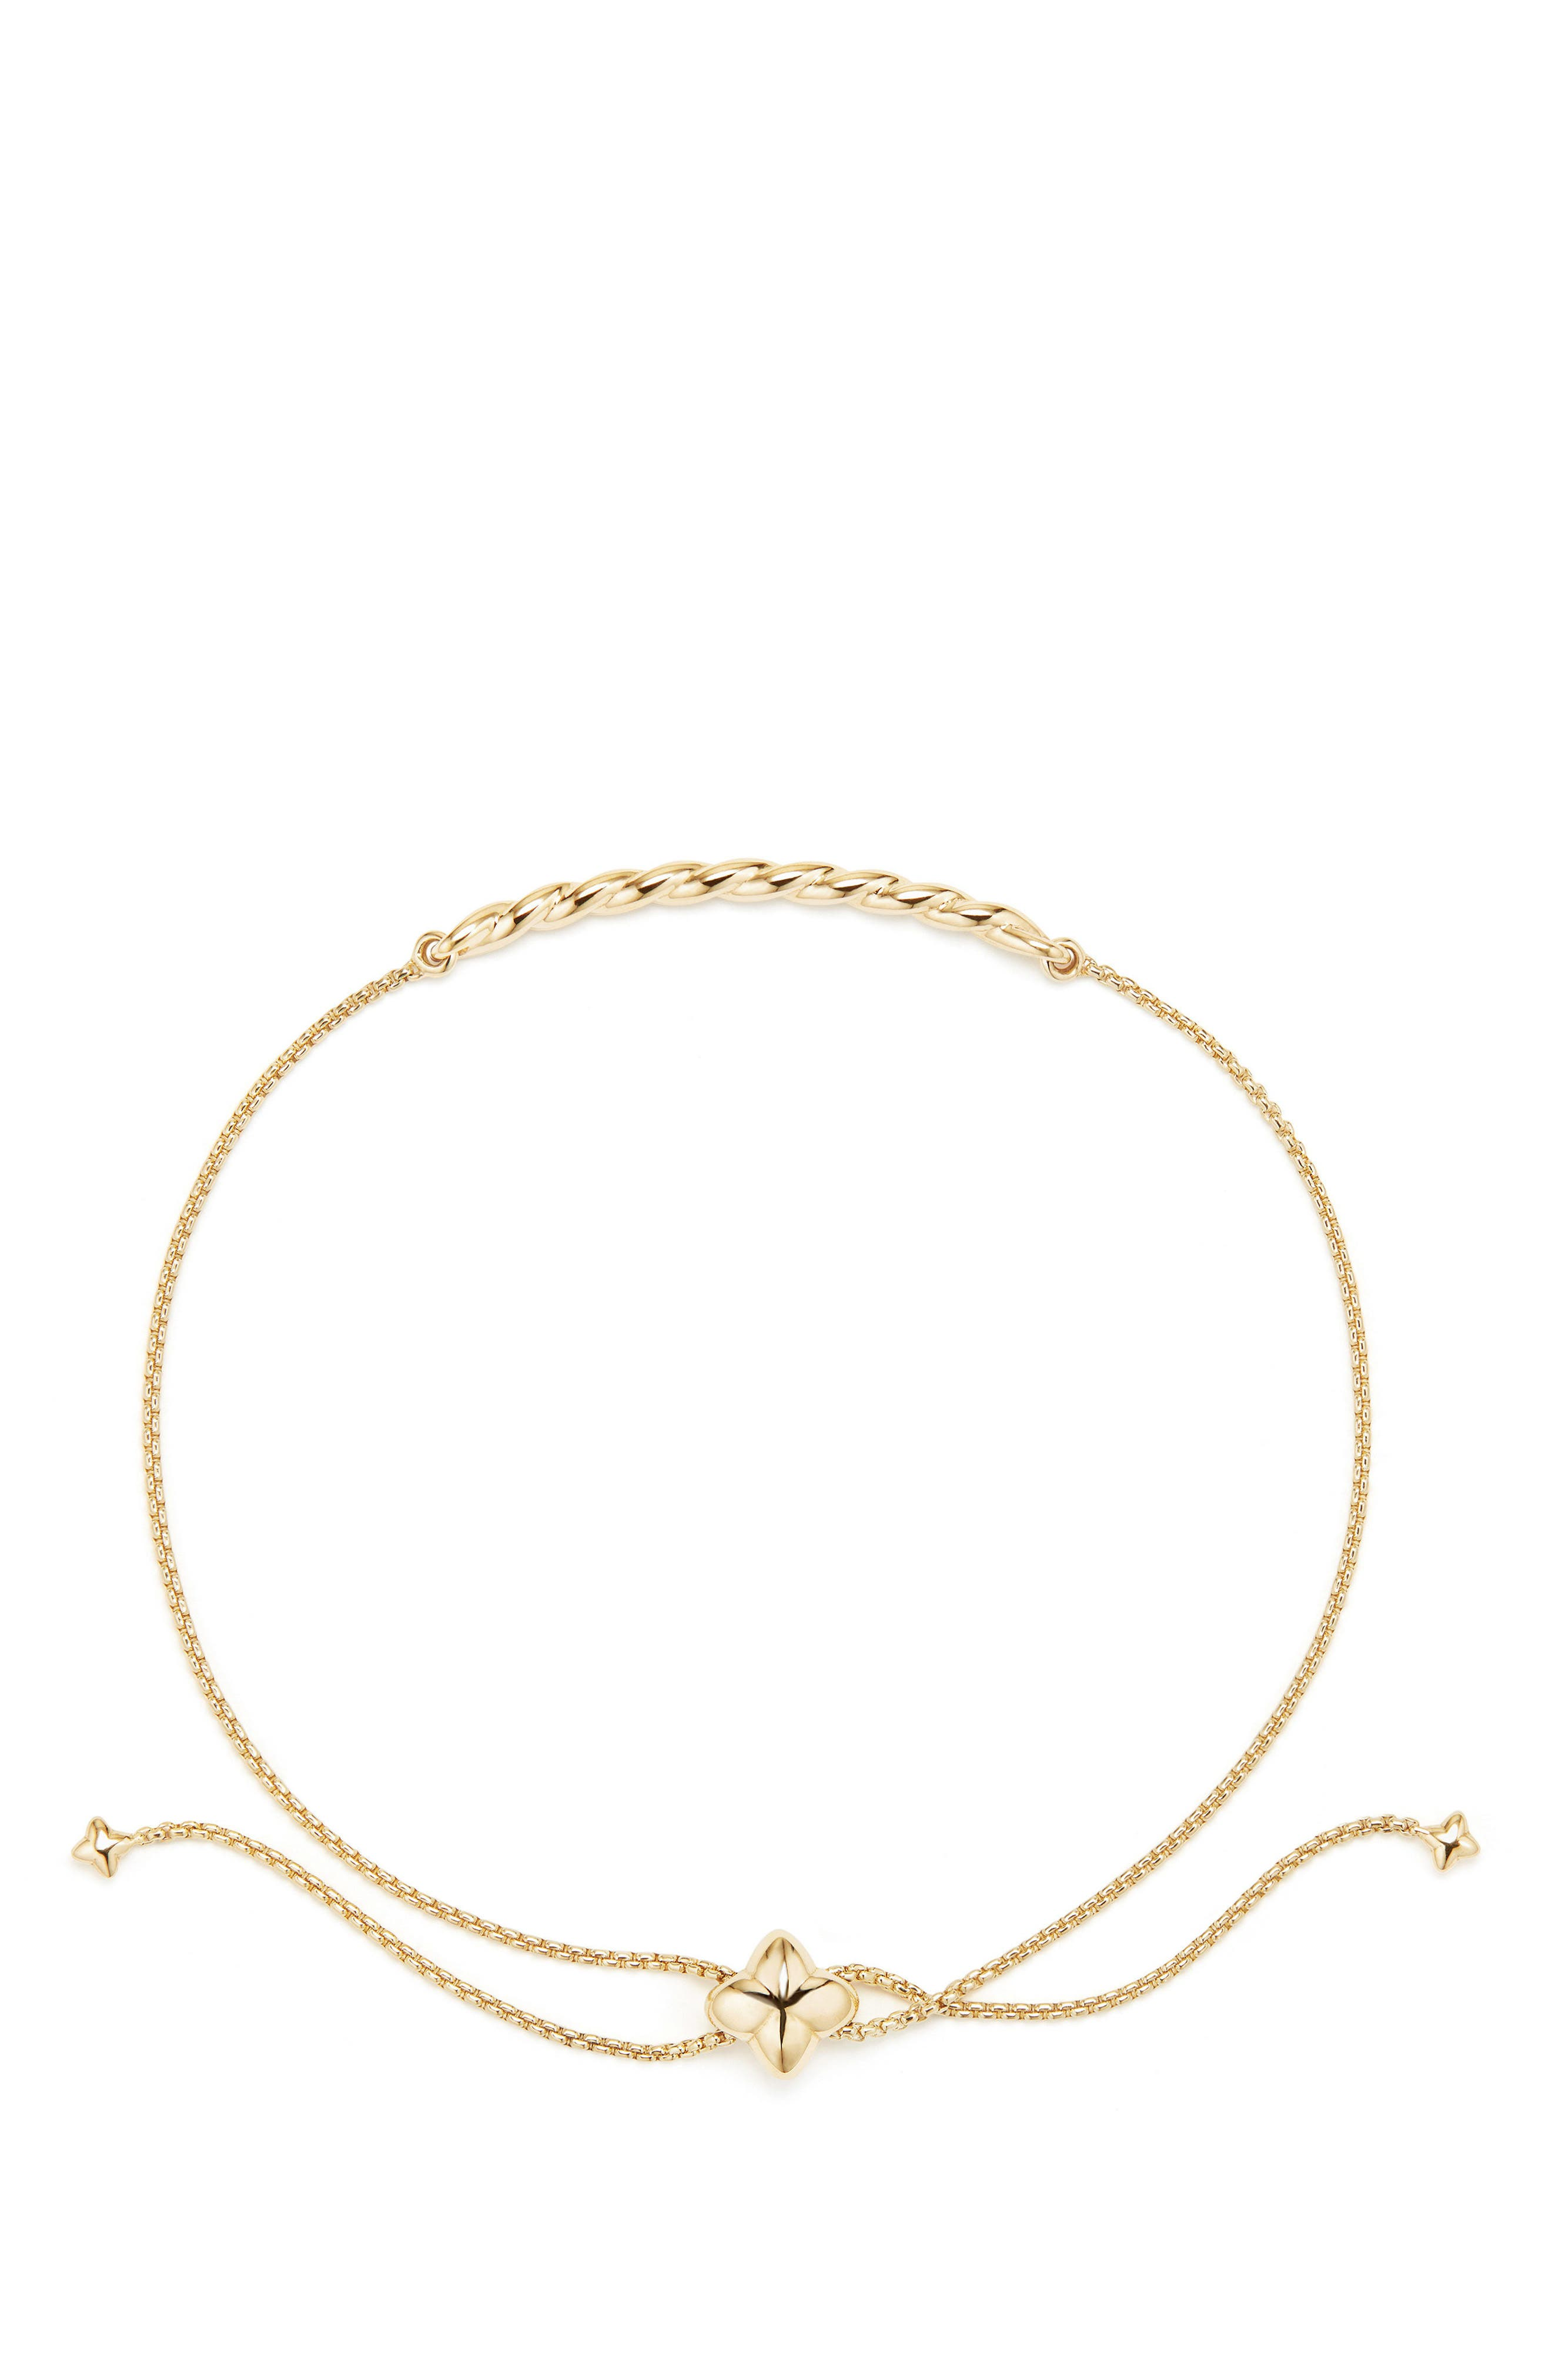 Paveflex Station Bracelet in 18K Gold,                             Alternate thumbnail 2, color,                             YELLOW GOLD